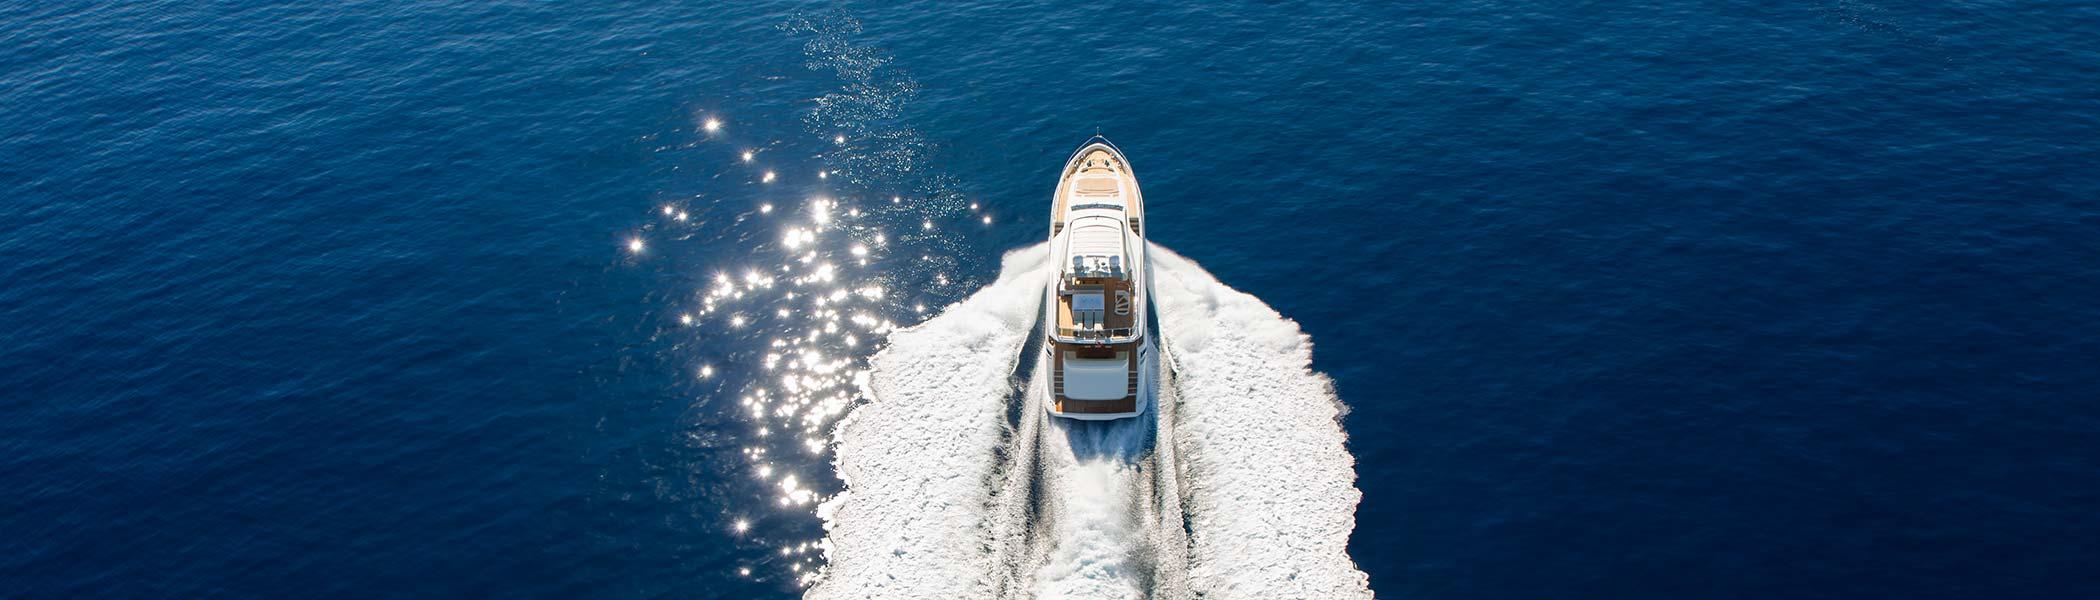 Amer Yacht - Amer Cento - NAVIGAZIONE-52